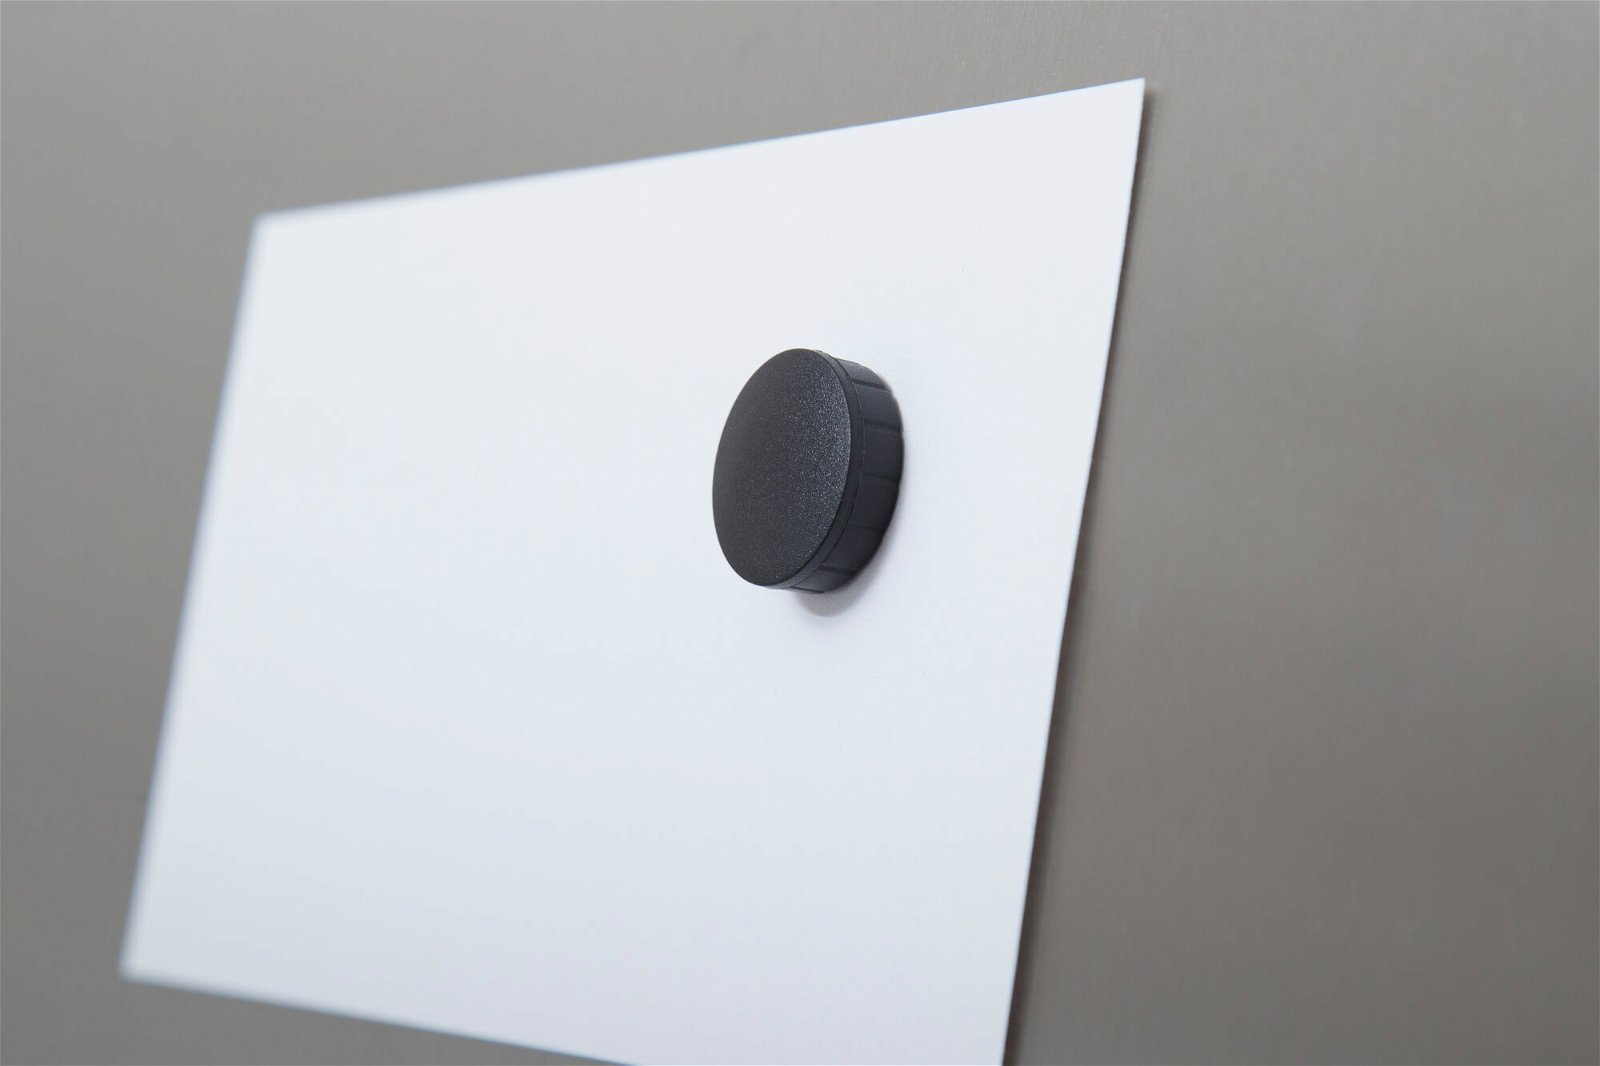 Magnet MAULsolid Ø 24 mm, 0,6 kg Haftkraft, 10 St./Ktn., schwarz